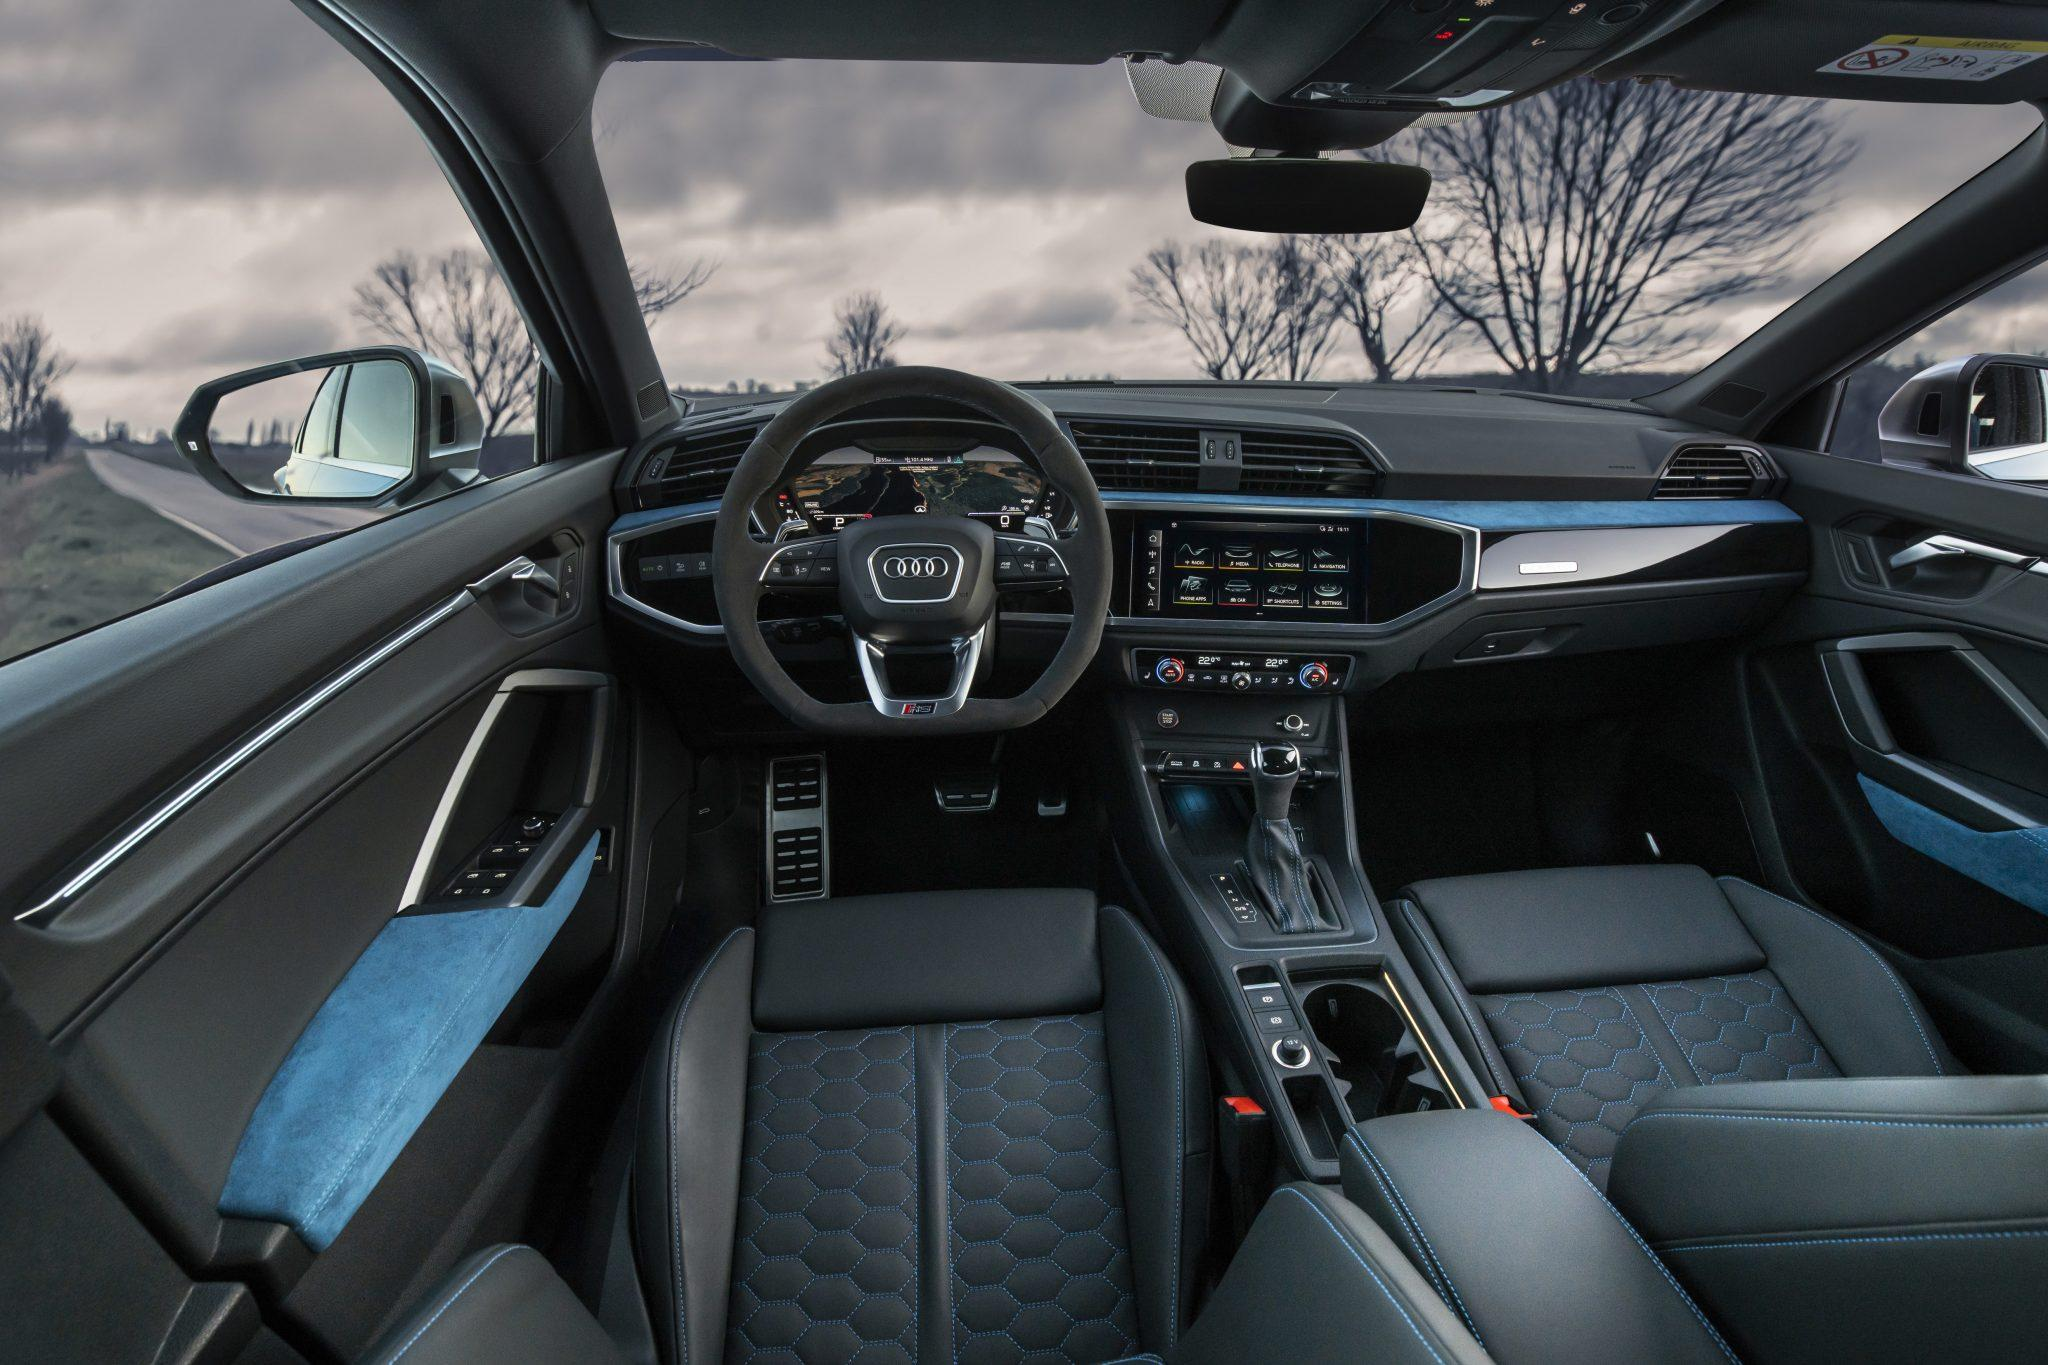 Interieur en dashboard Audi RS Q3 Sportback